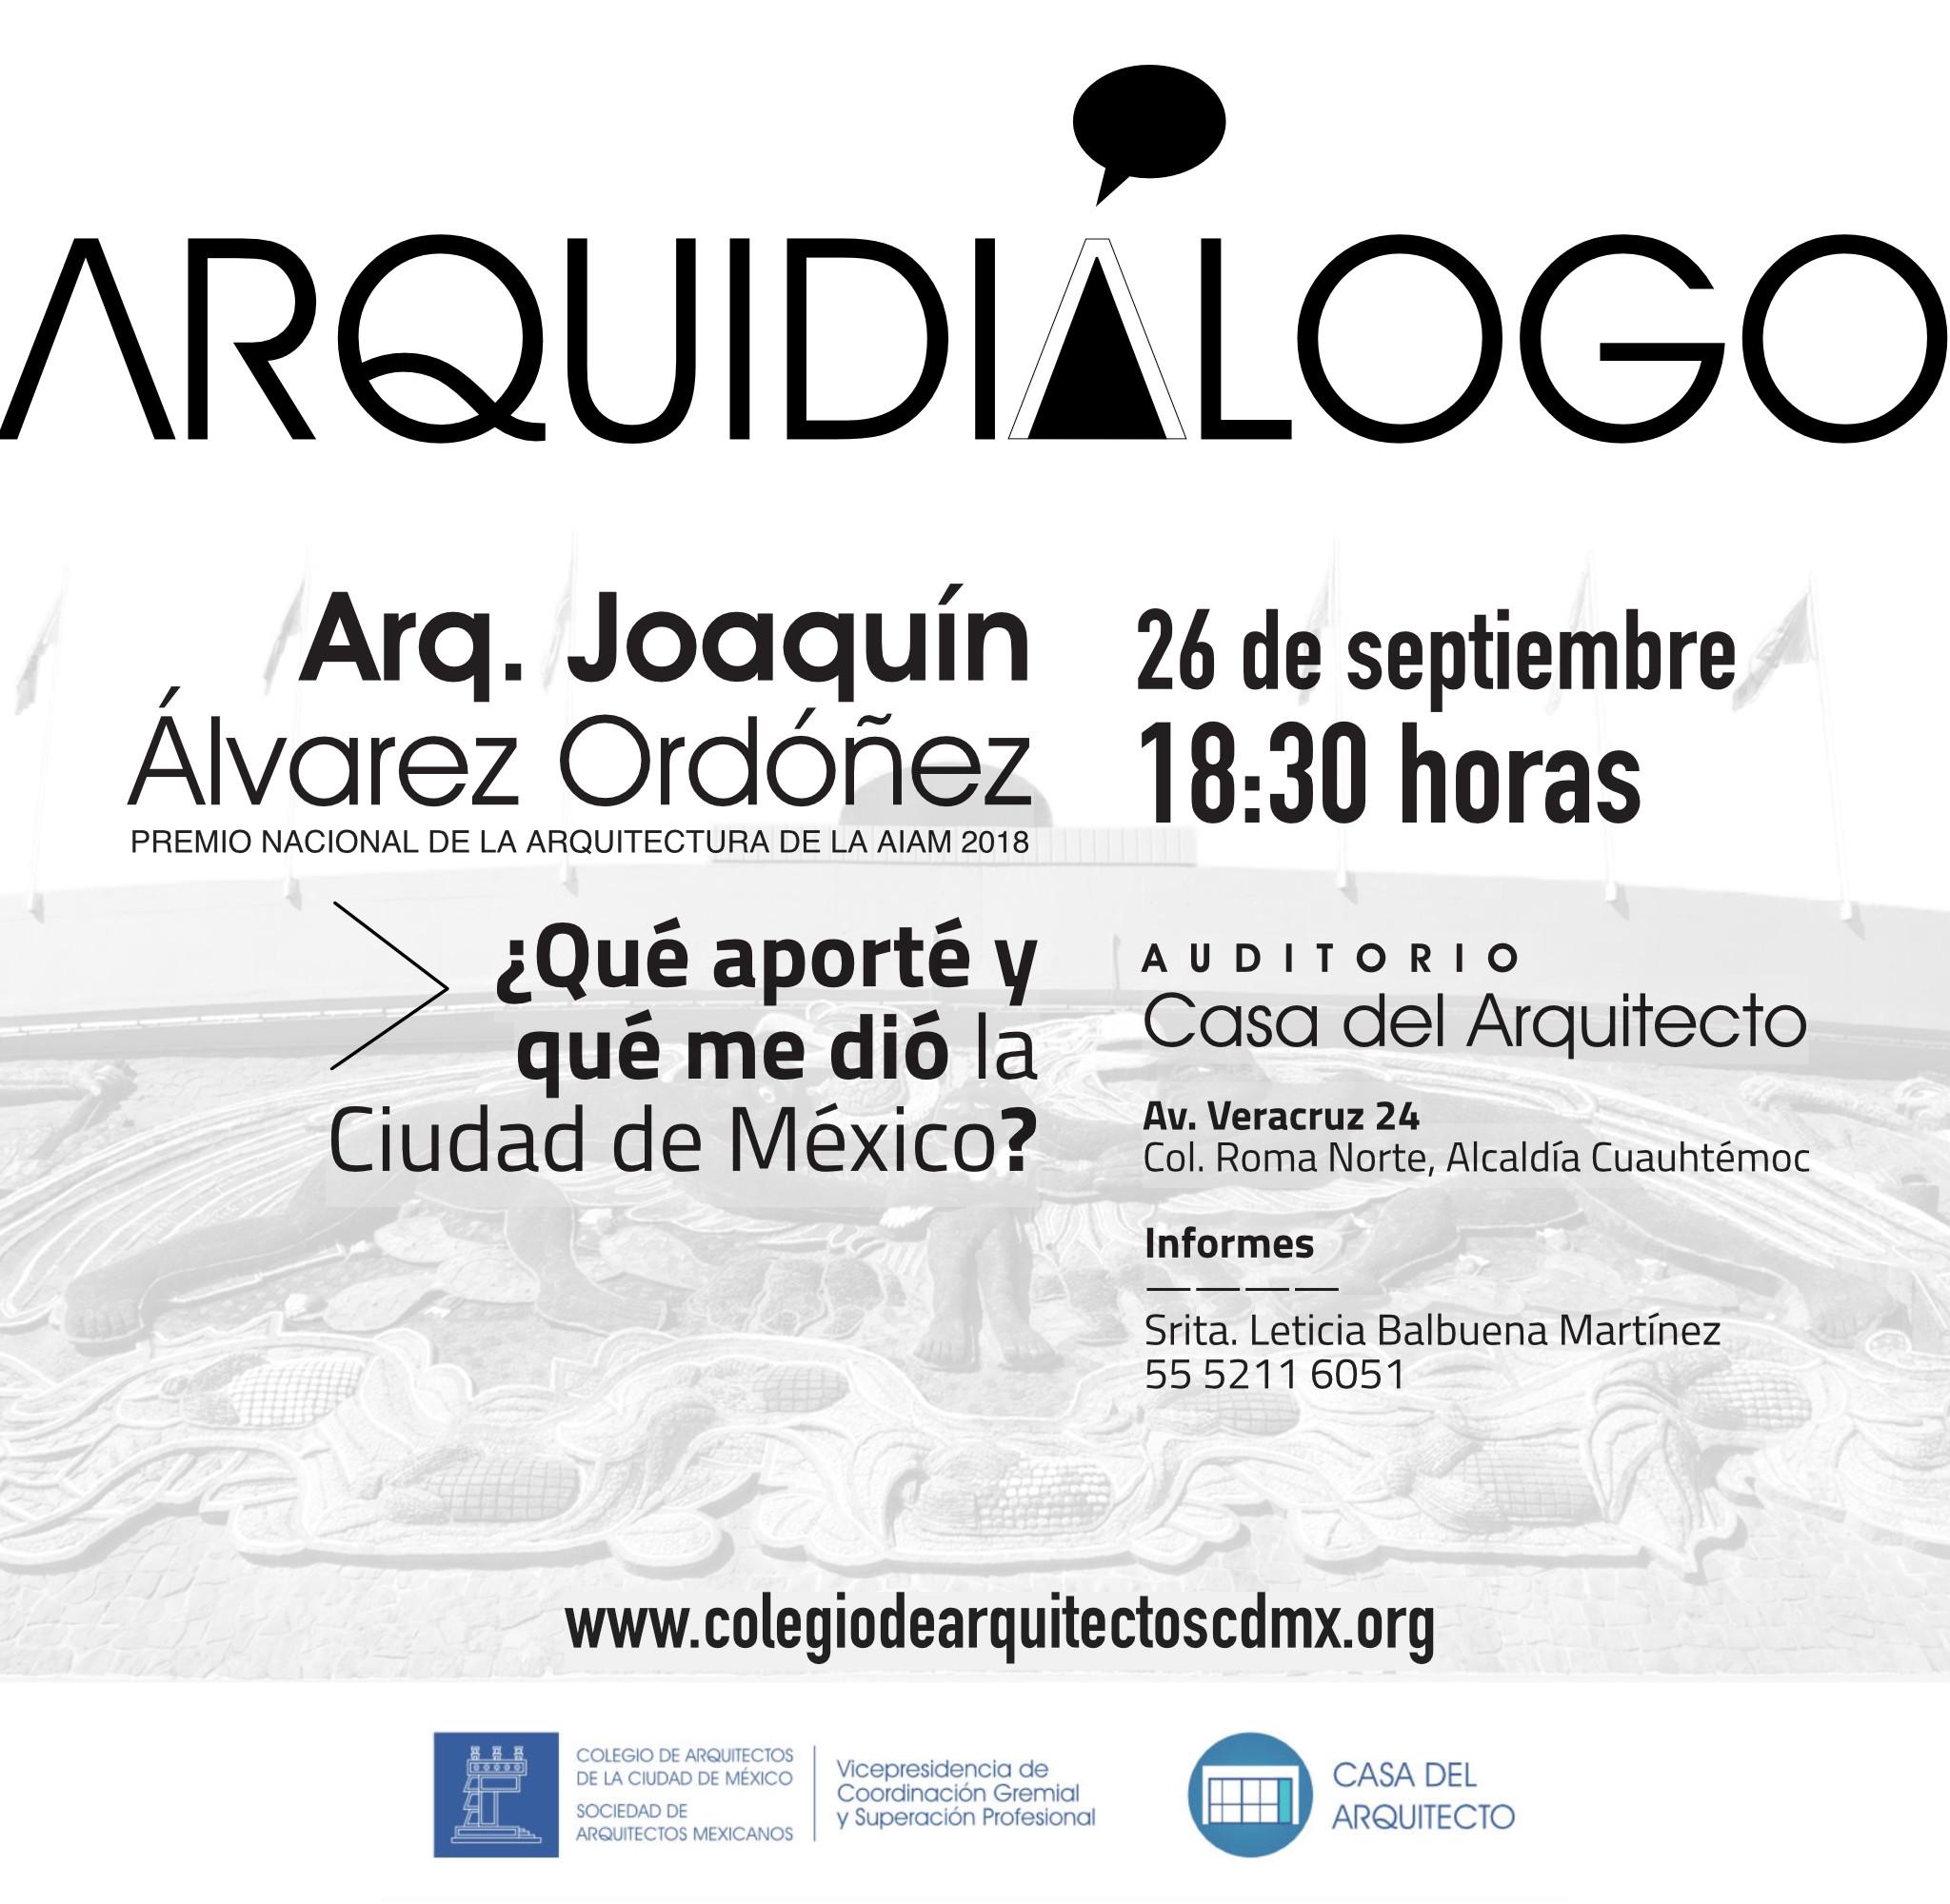 Arquidialogo Arq. Joaquín Álvarez